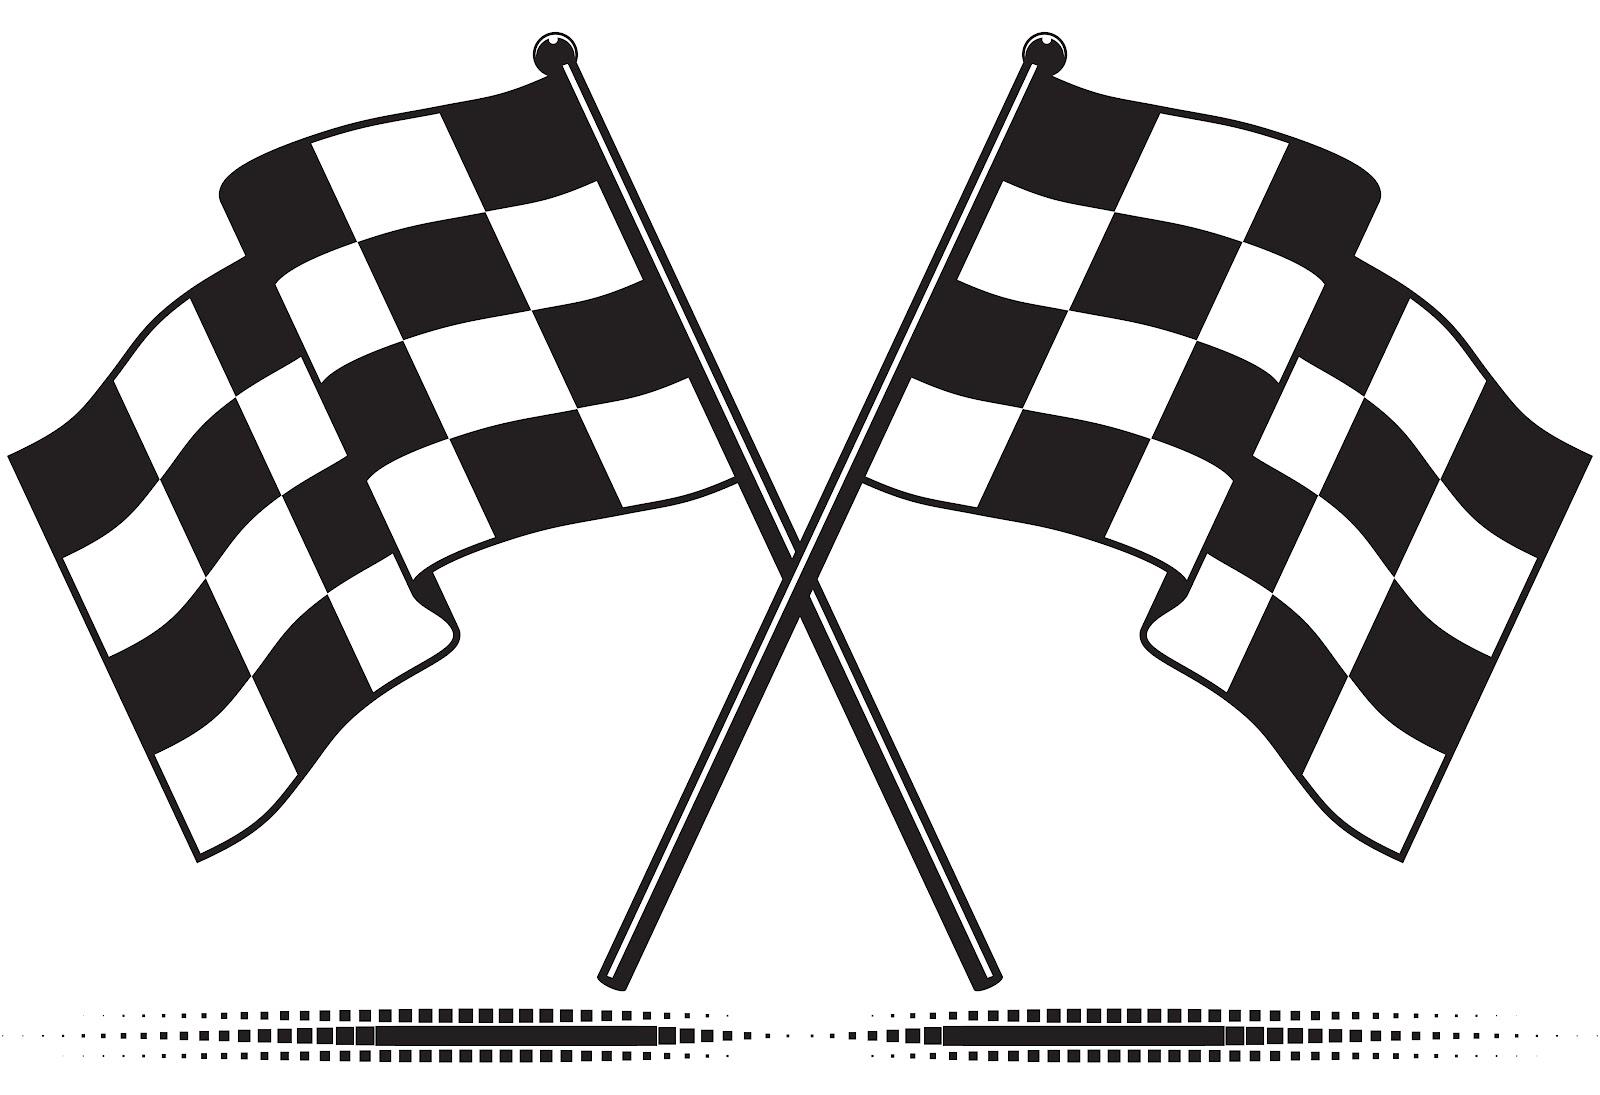 Checkered flag images clip art.